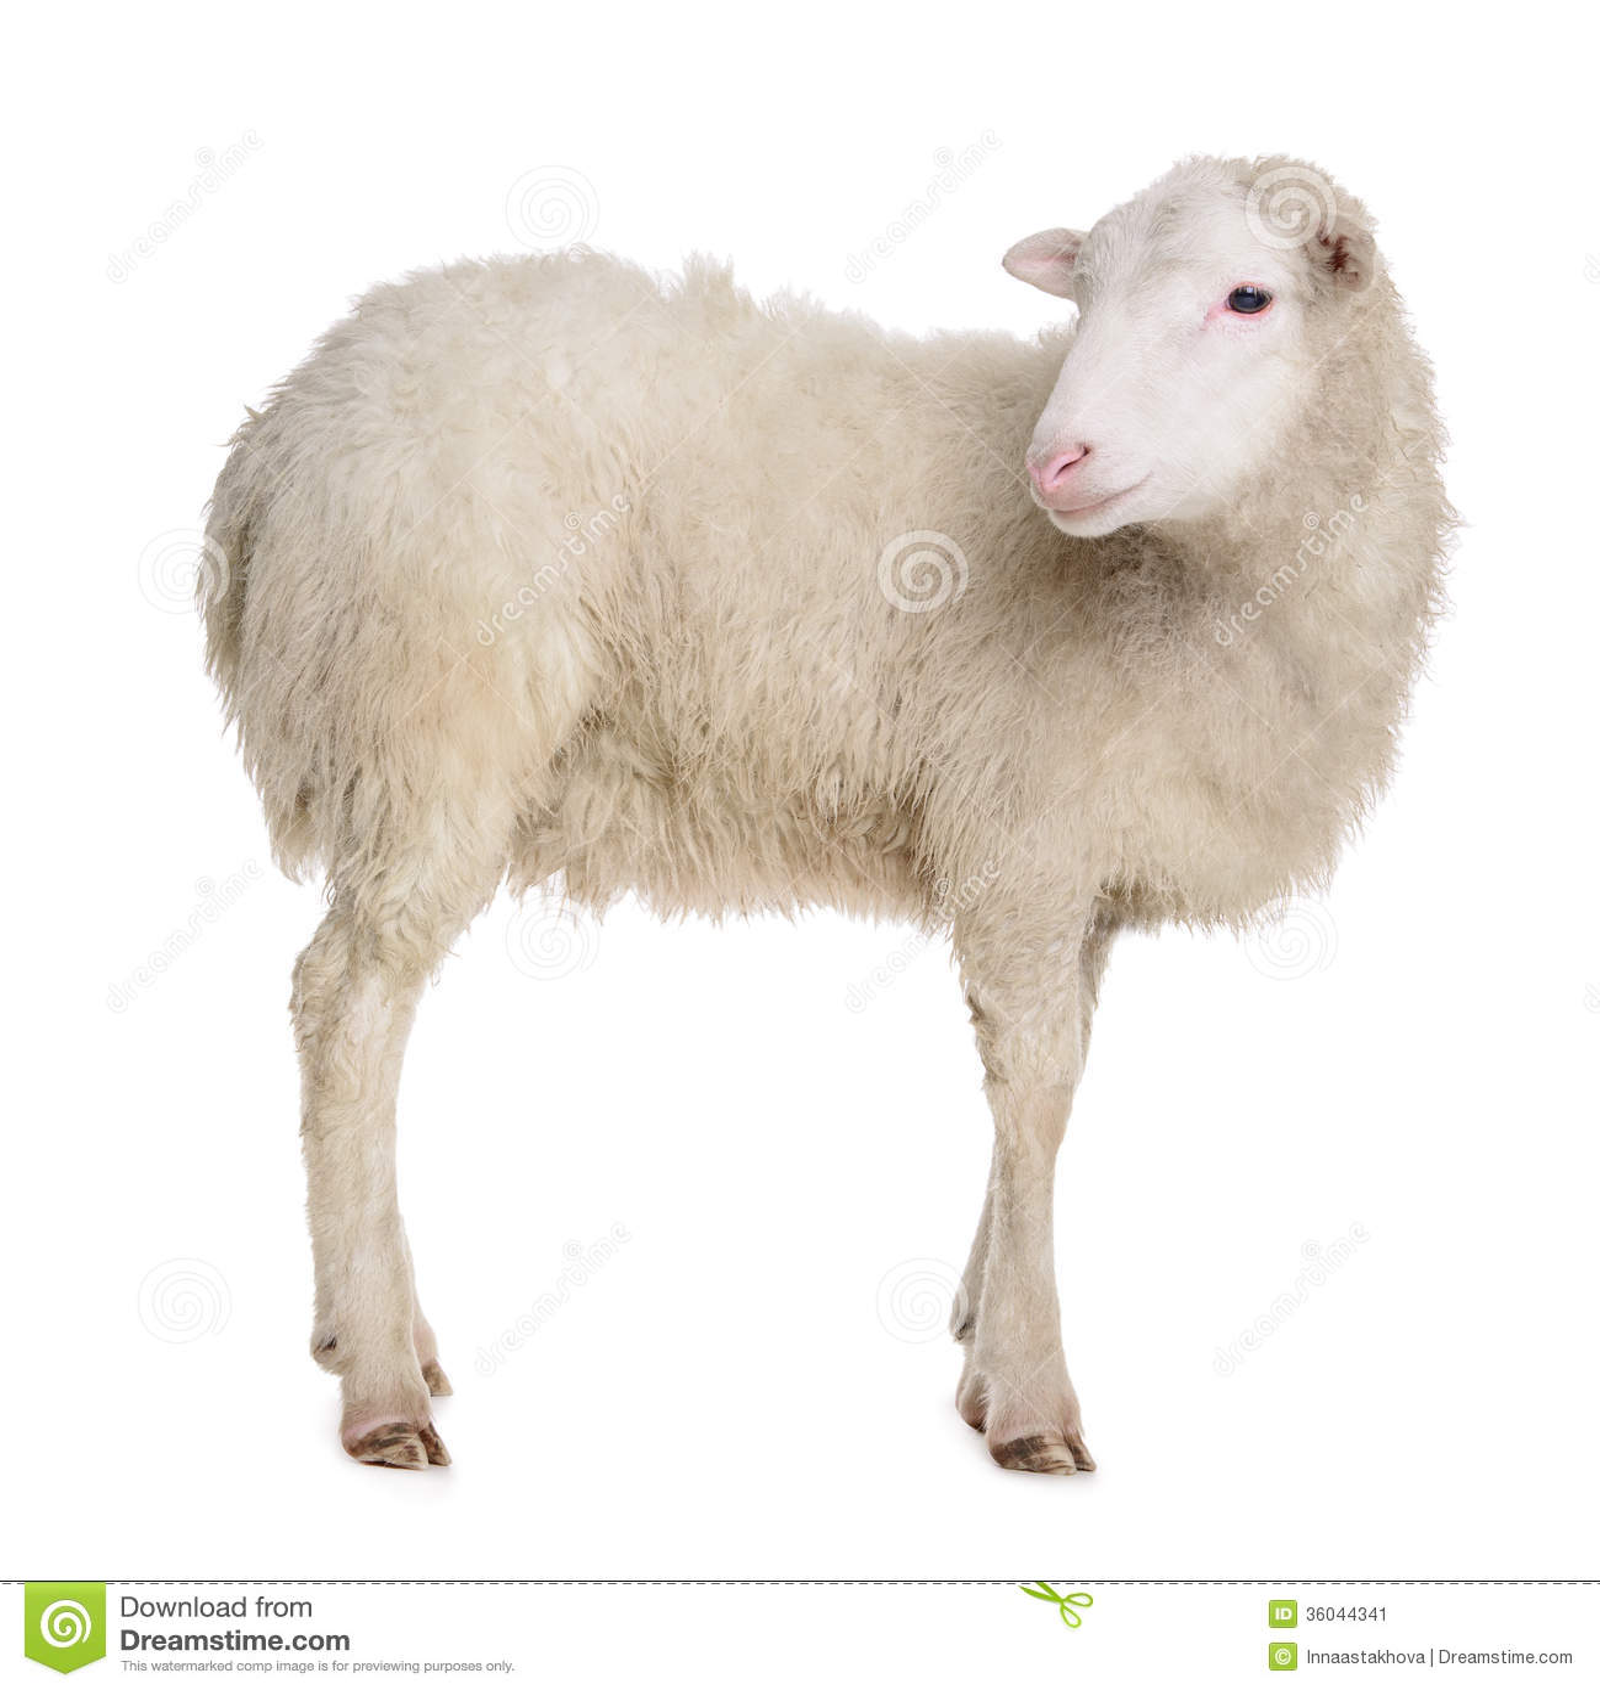 White sheep - photo#16